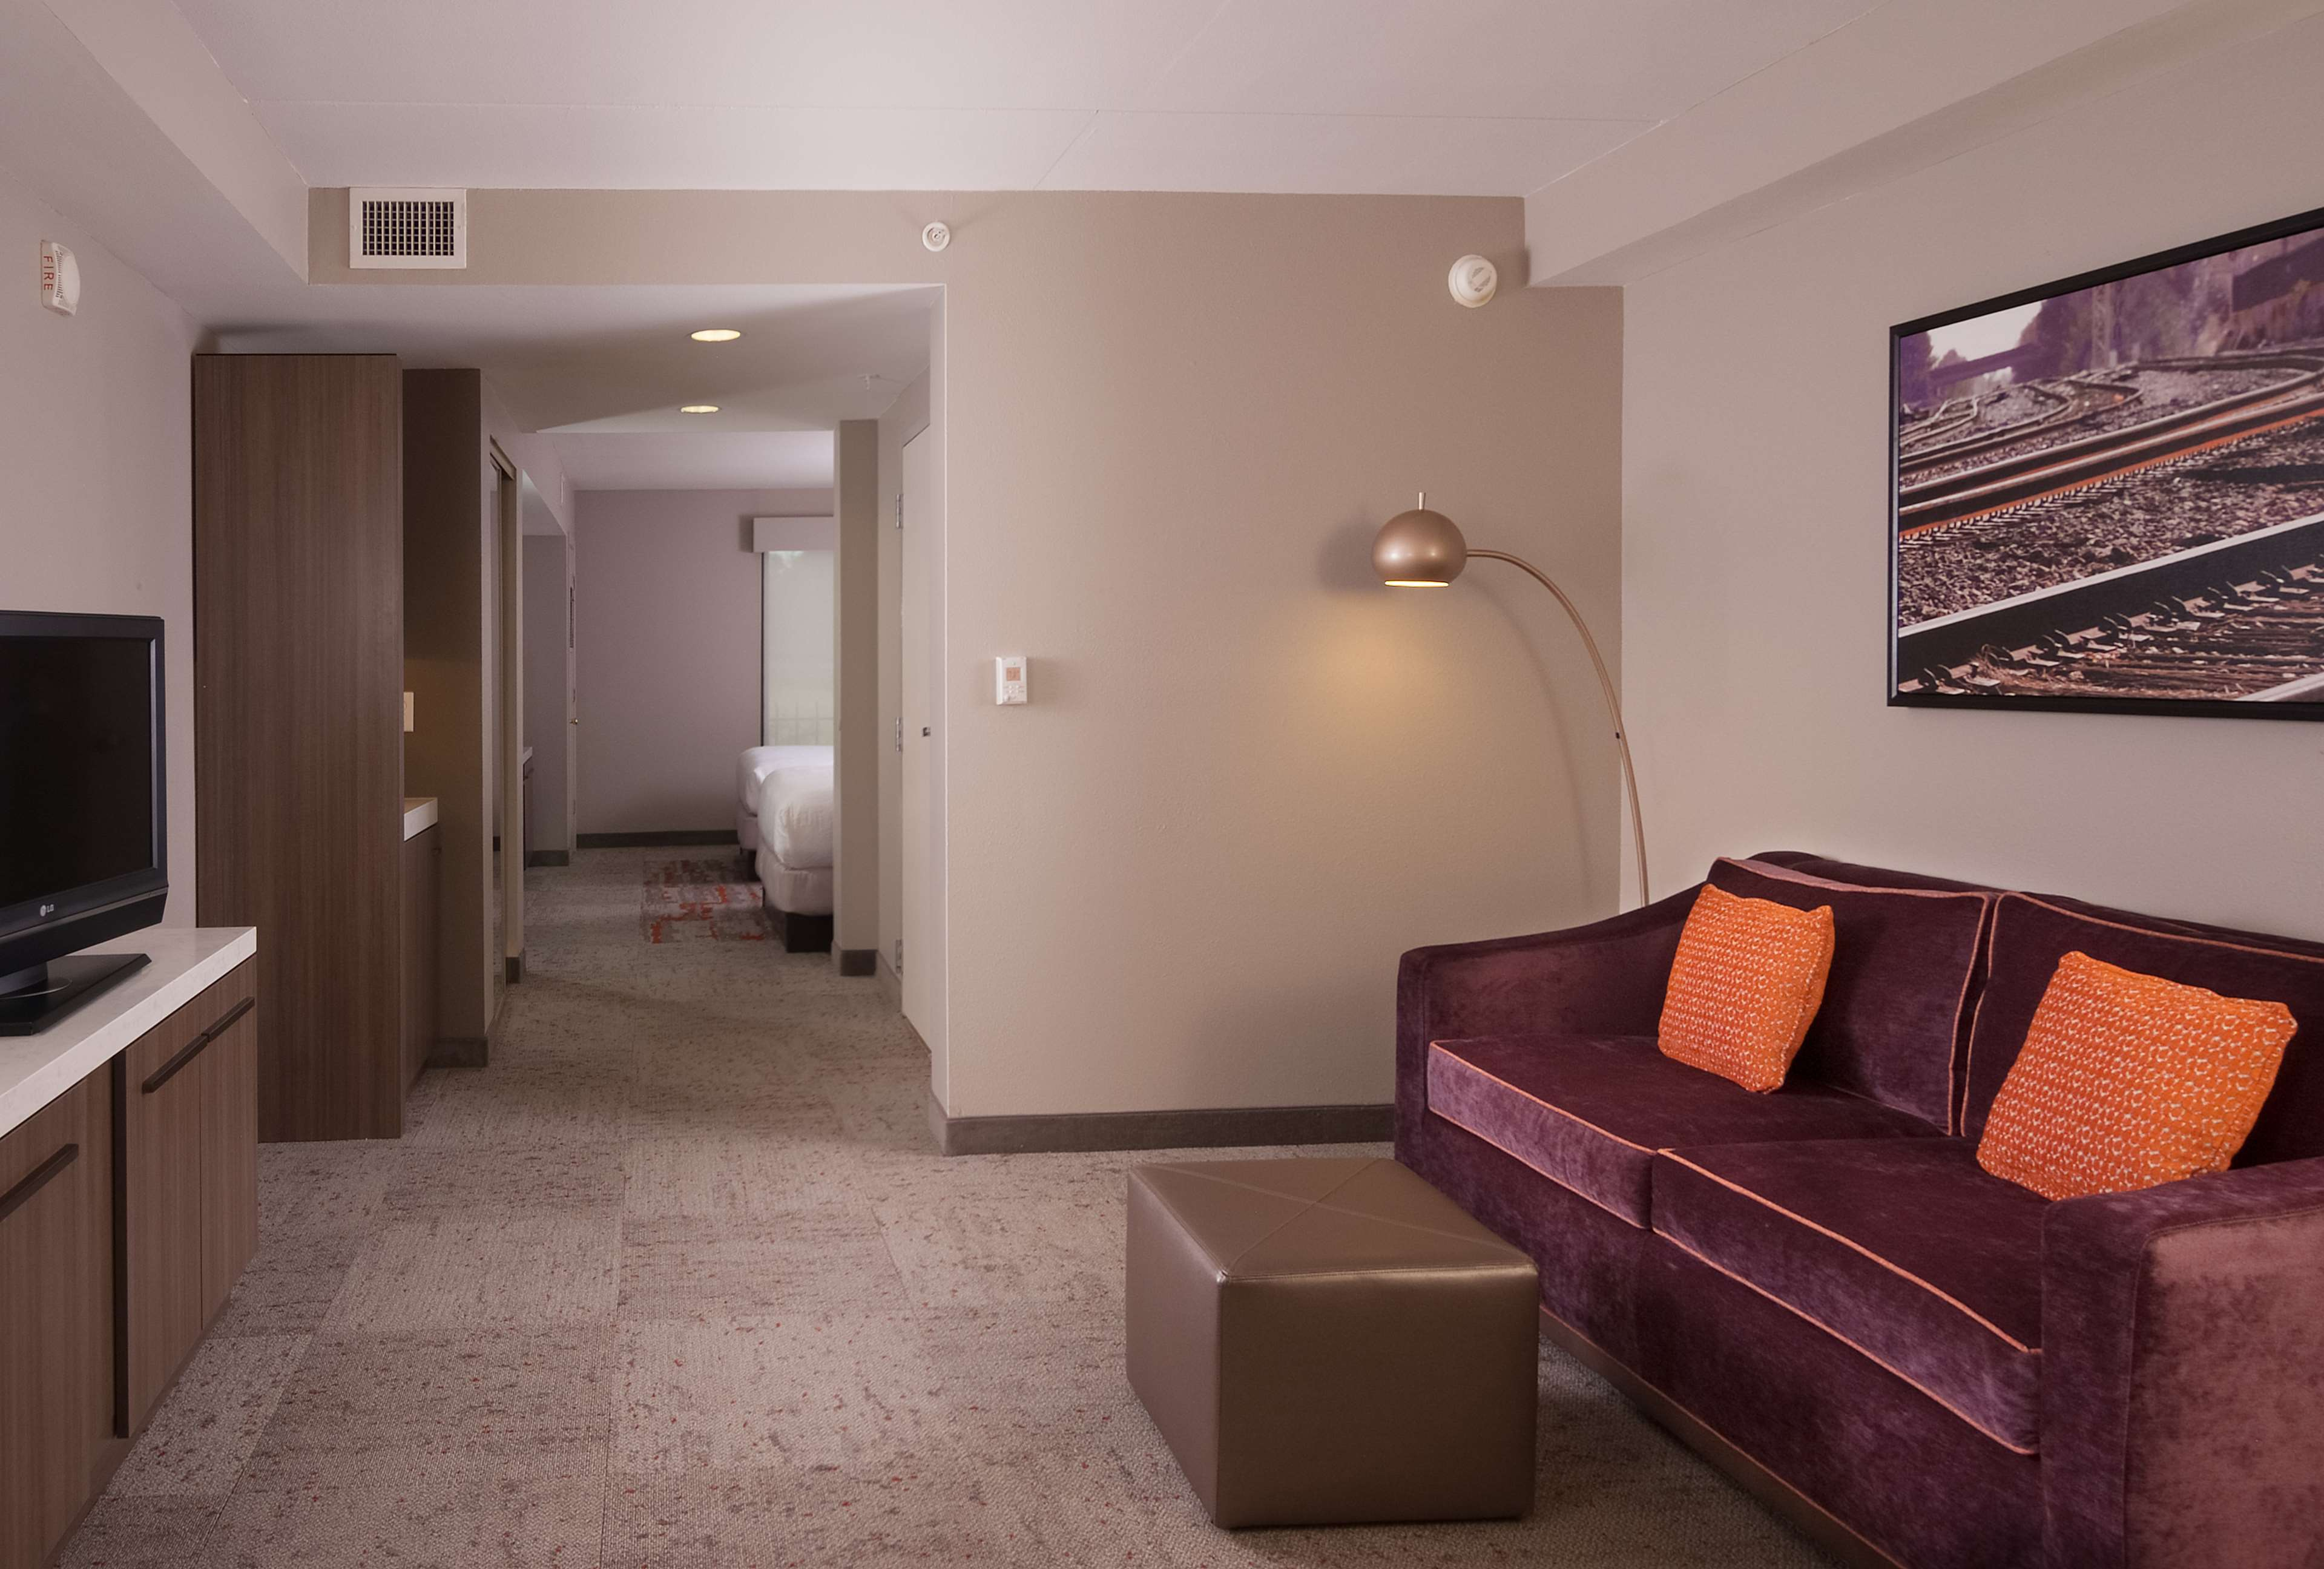 Hilton Garden Inn Atlanta Airport/Millenium Center image 15